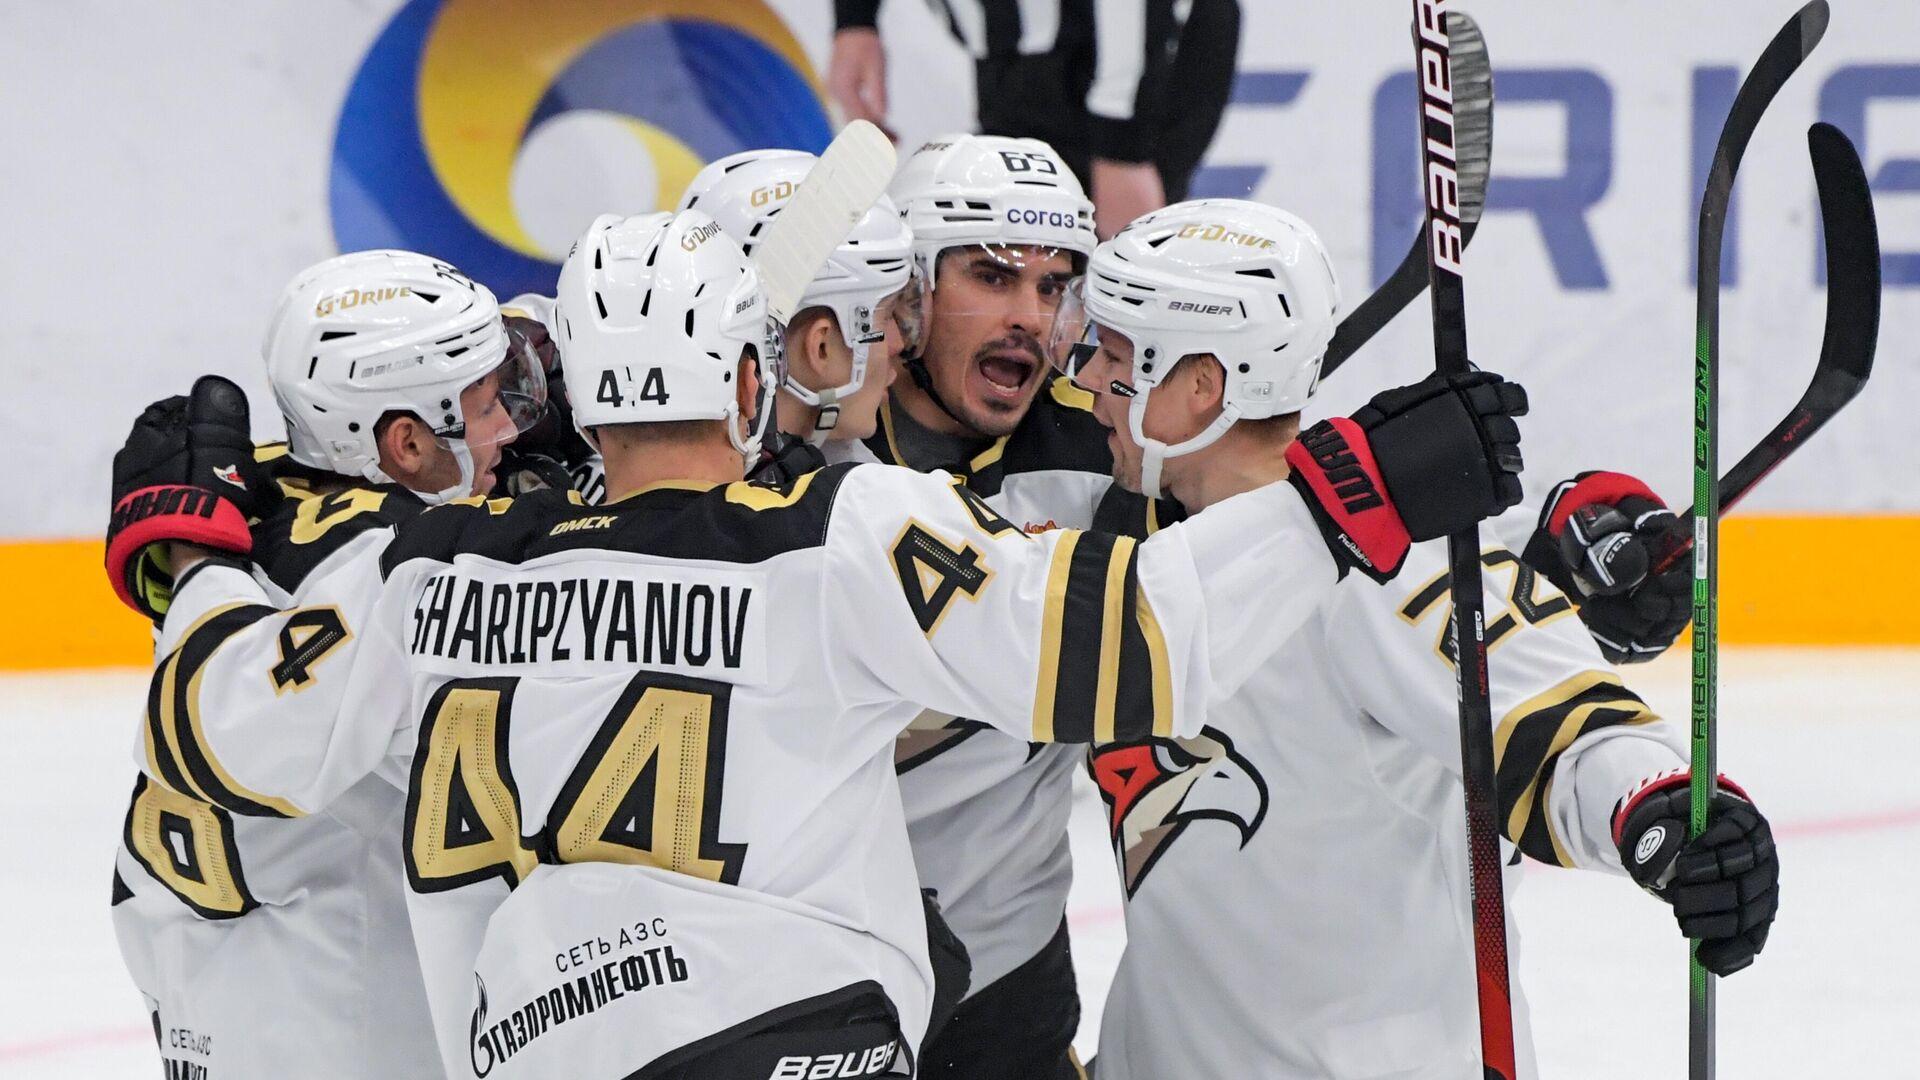 Хоккеисты Авангарда - РИА Новости, 1920, 21.09.2021